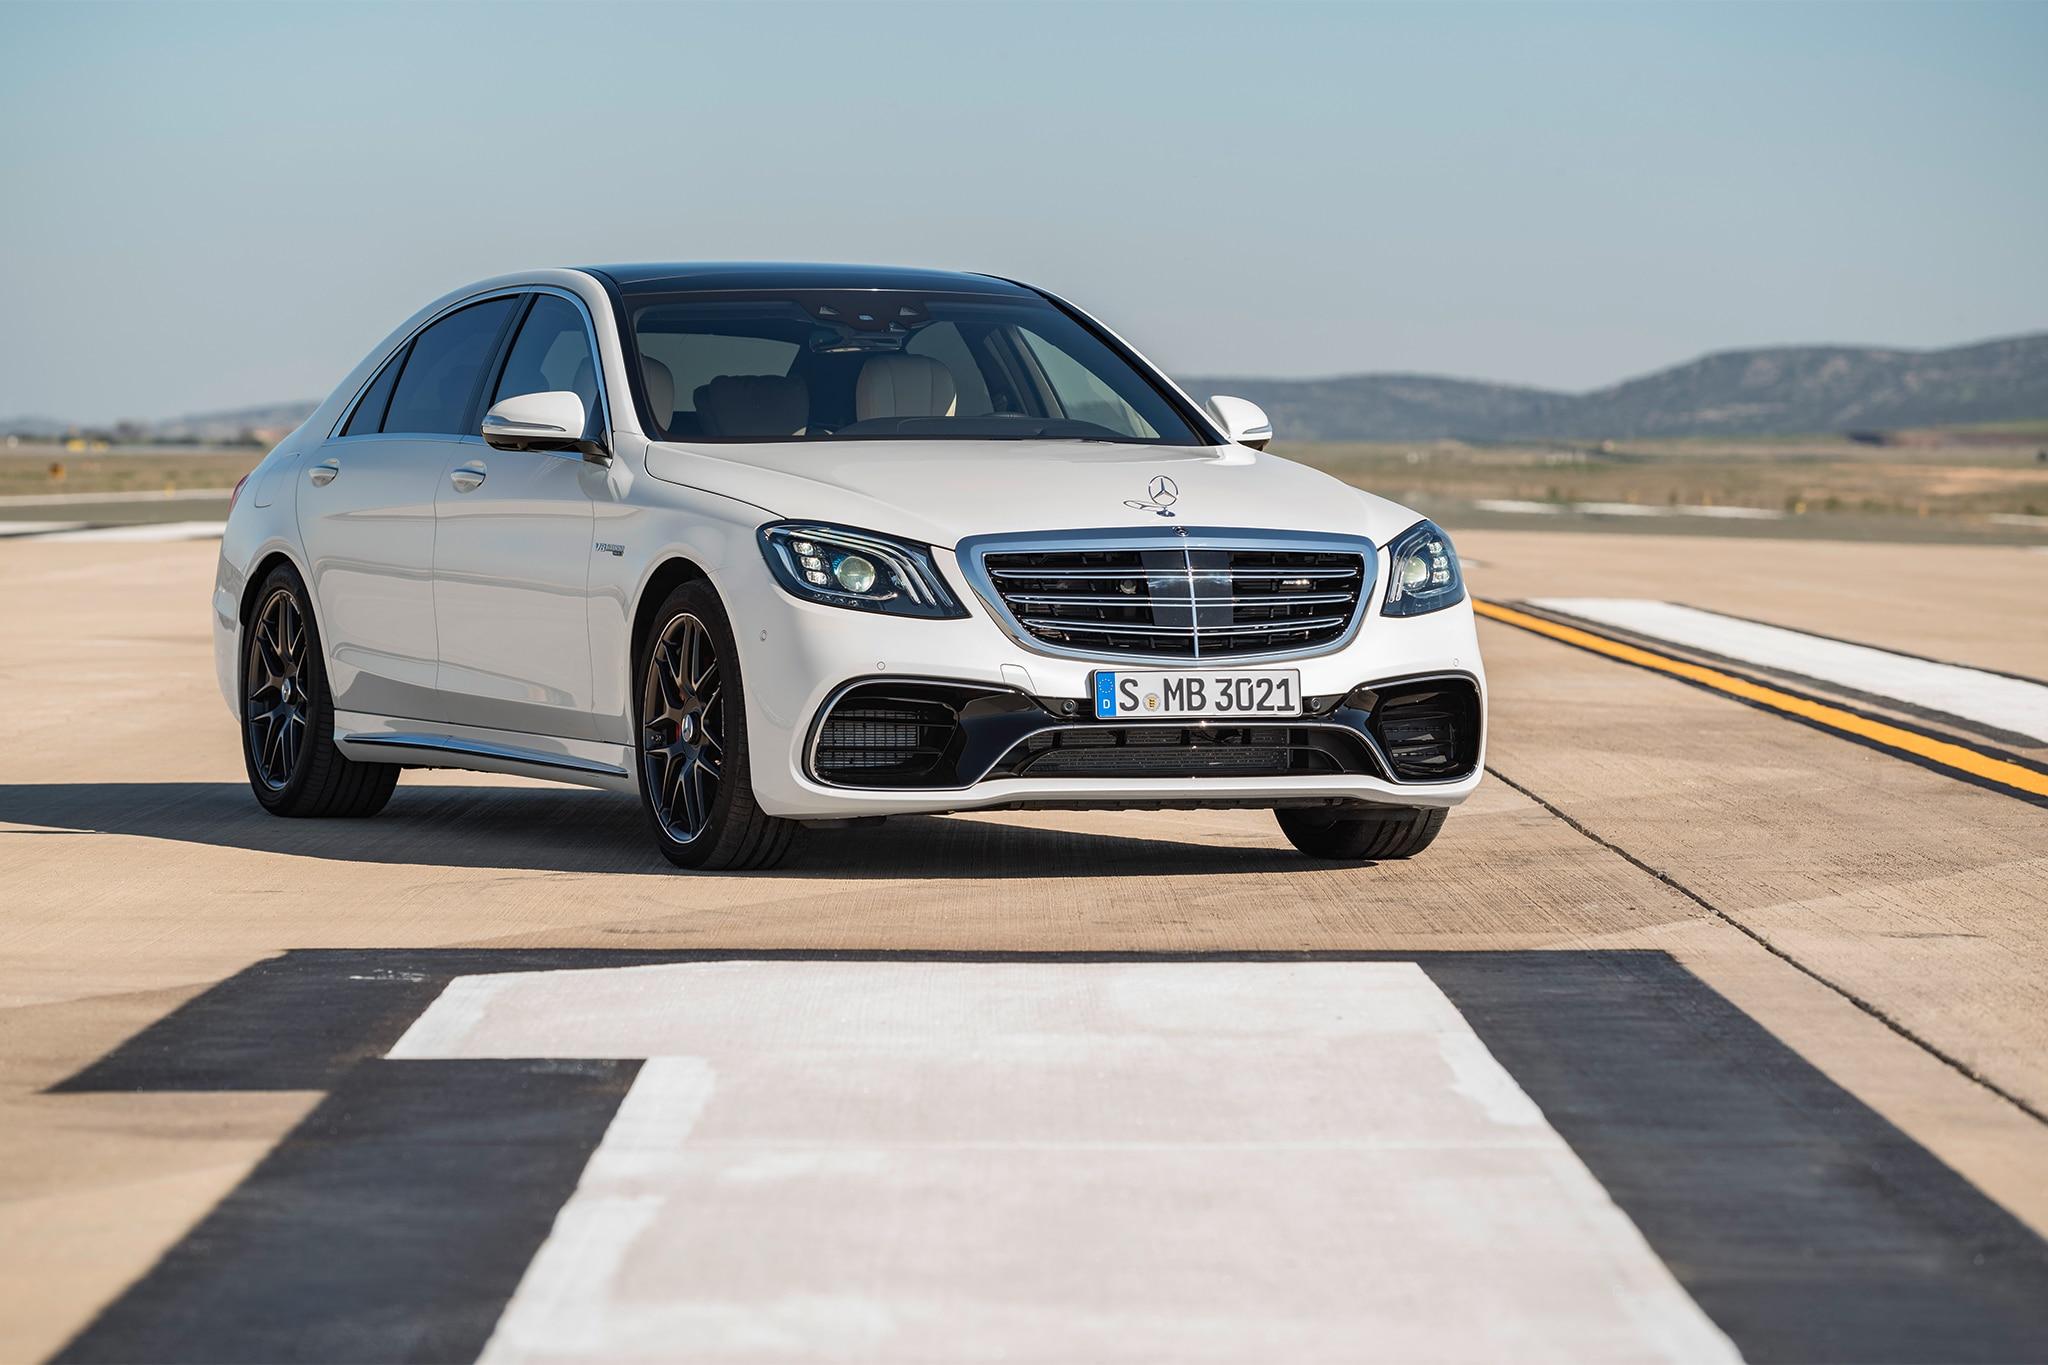 https://st.automobilemag.com/uploads/sites/11/2017/04/2018-Mercedes-AMG-S63-front-three-quarter-03.jpg